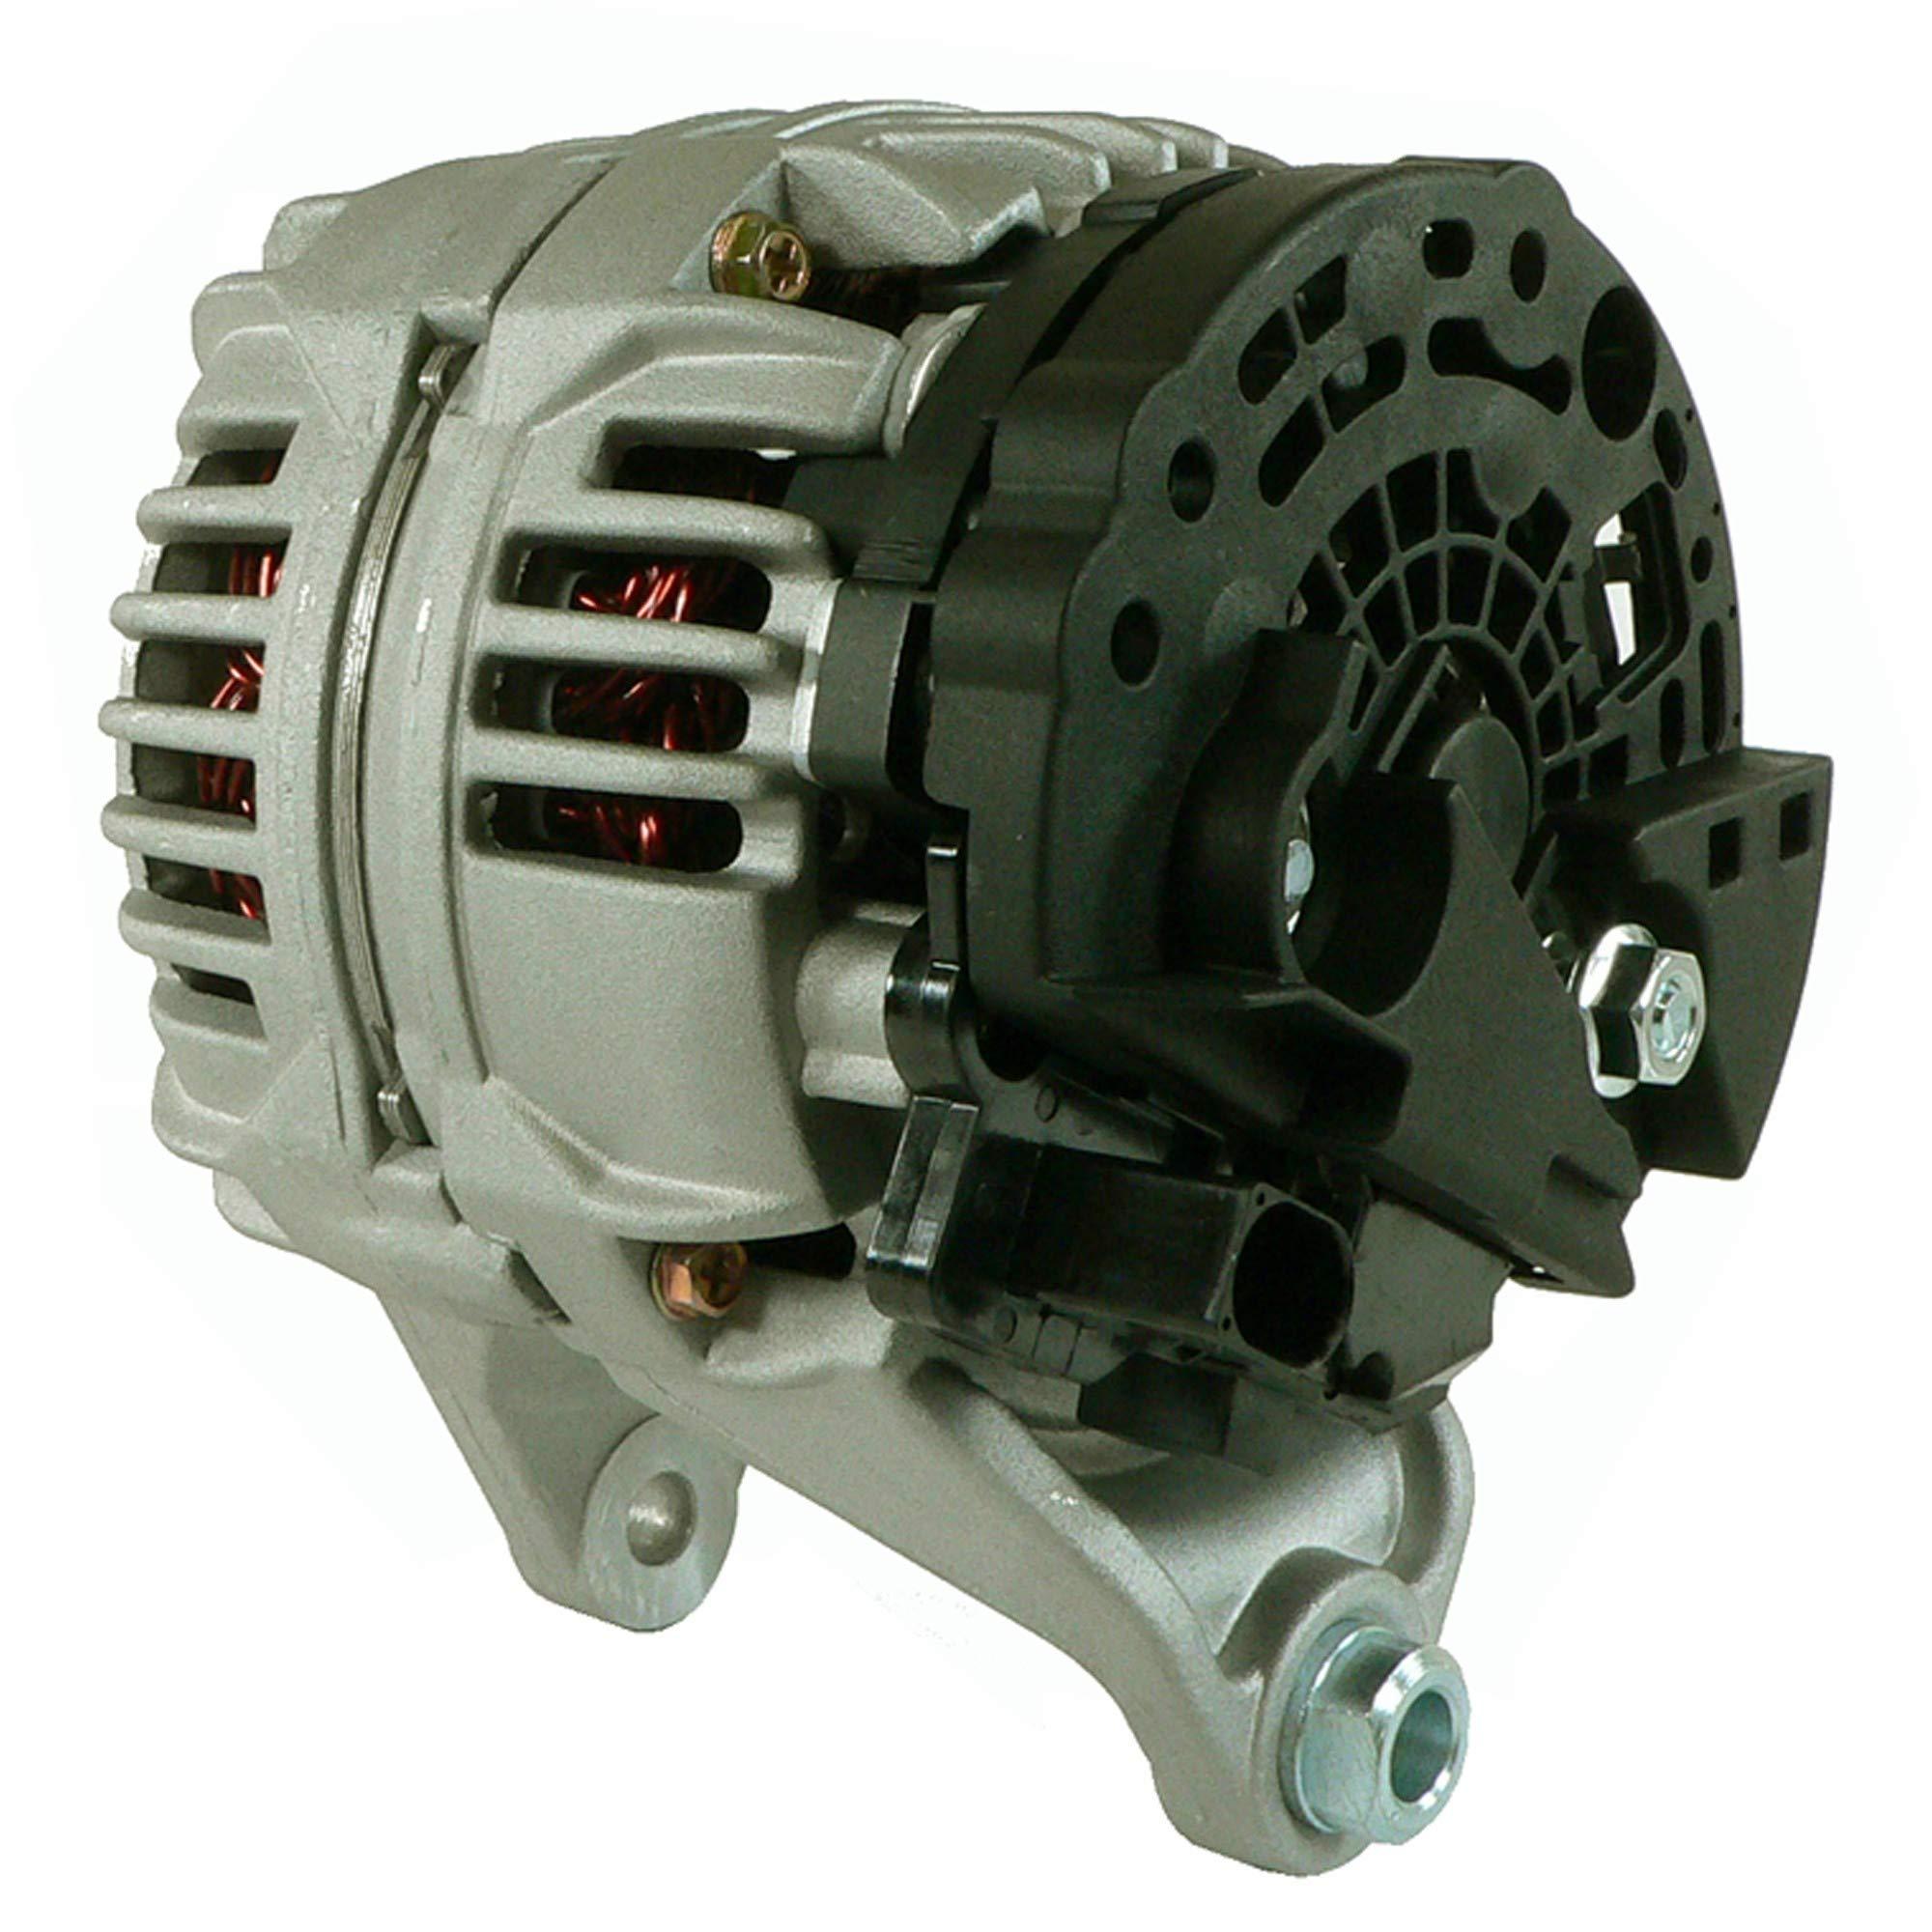 DB Electrical ABO0231 New Alternator For Volkswagen 2.8L 2.8 Passat 99 00 01 02 03 04 1999 2000 2001 2002 2003 2004 Audi 2.7L 2.7 A4 A6 Quattro 01 04 2001 2004 06C-903-016 06C-903-016A 113751